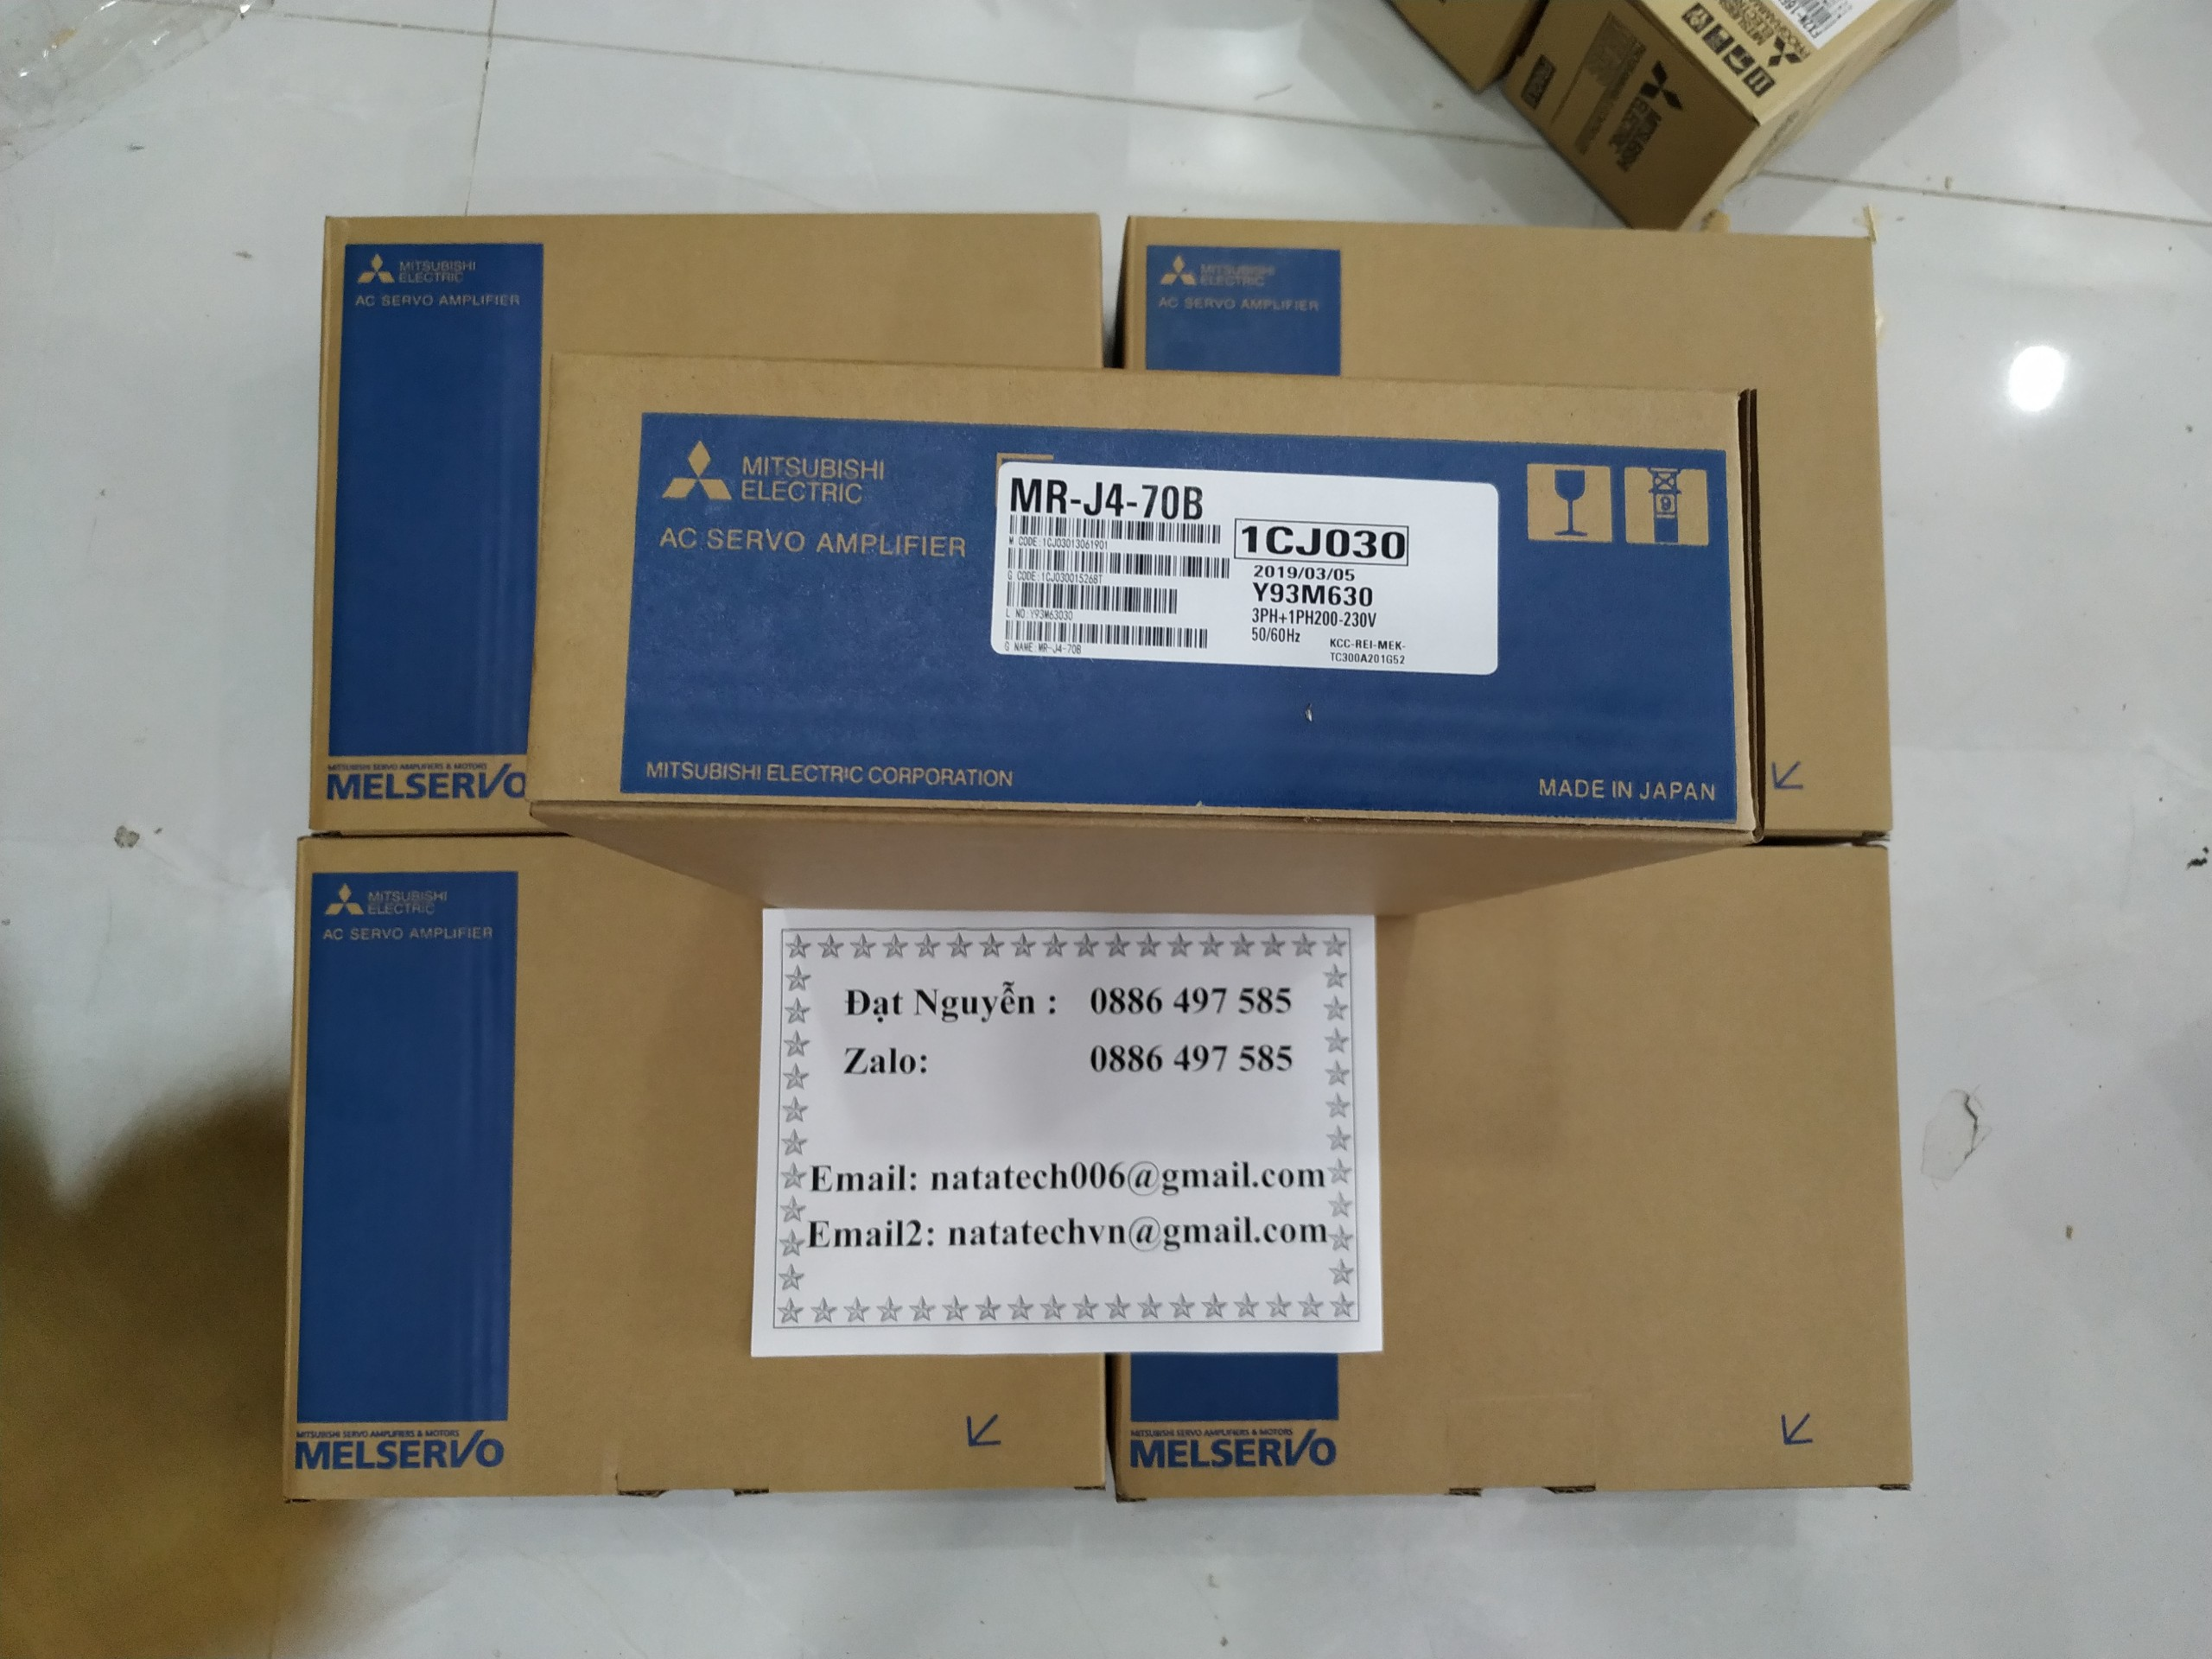 MR-J4-70B-Amplifier- Mitsubishi,